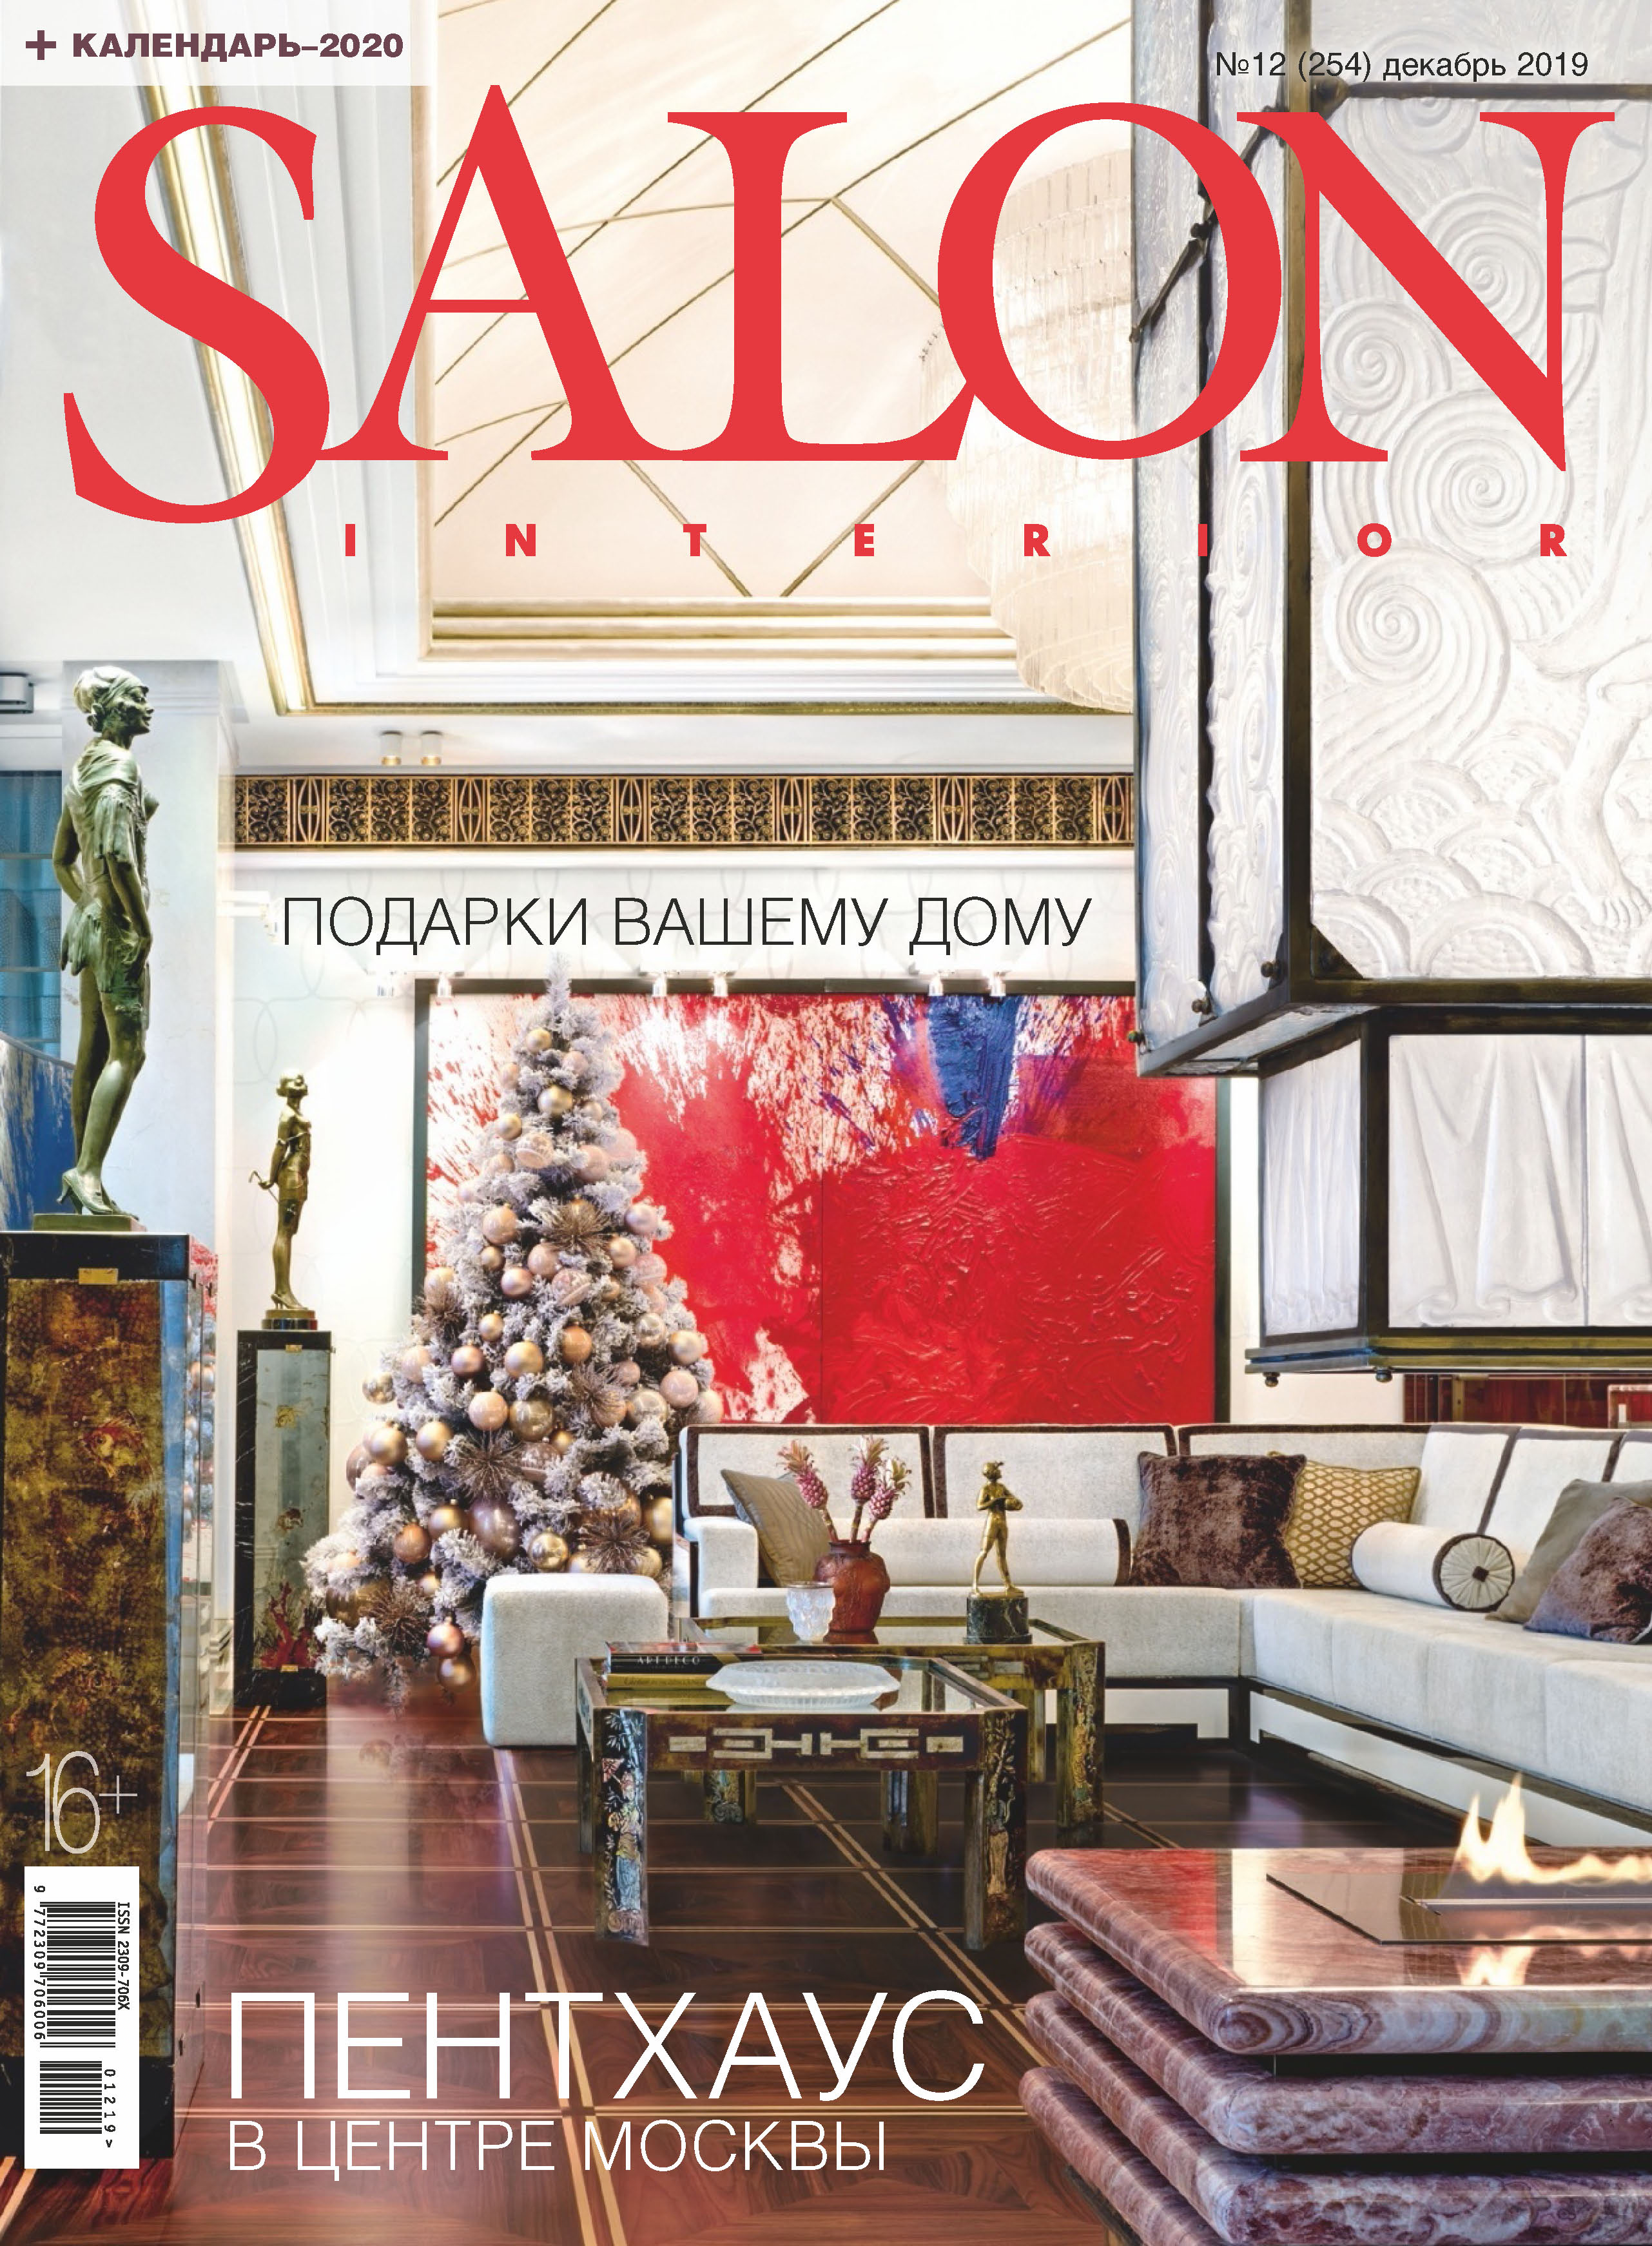 SALON-interior №12/2019